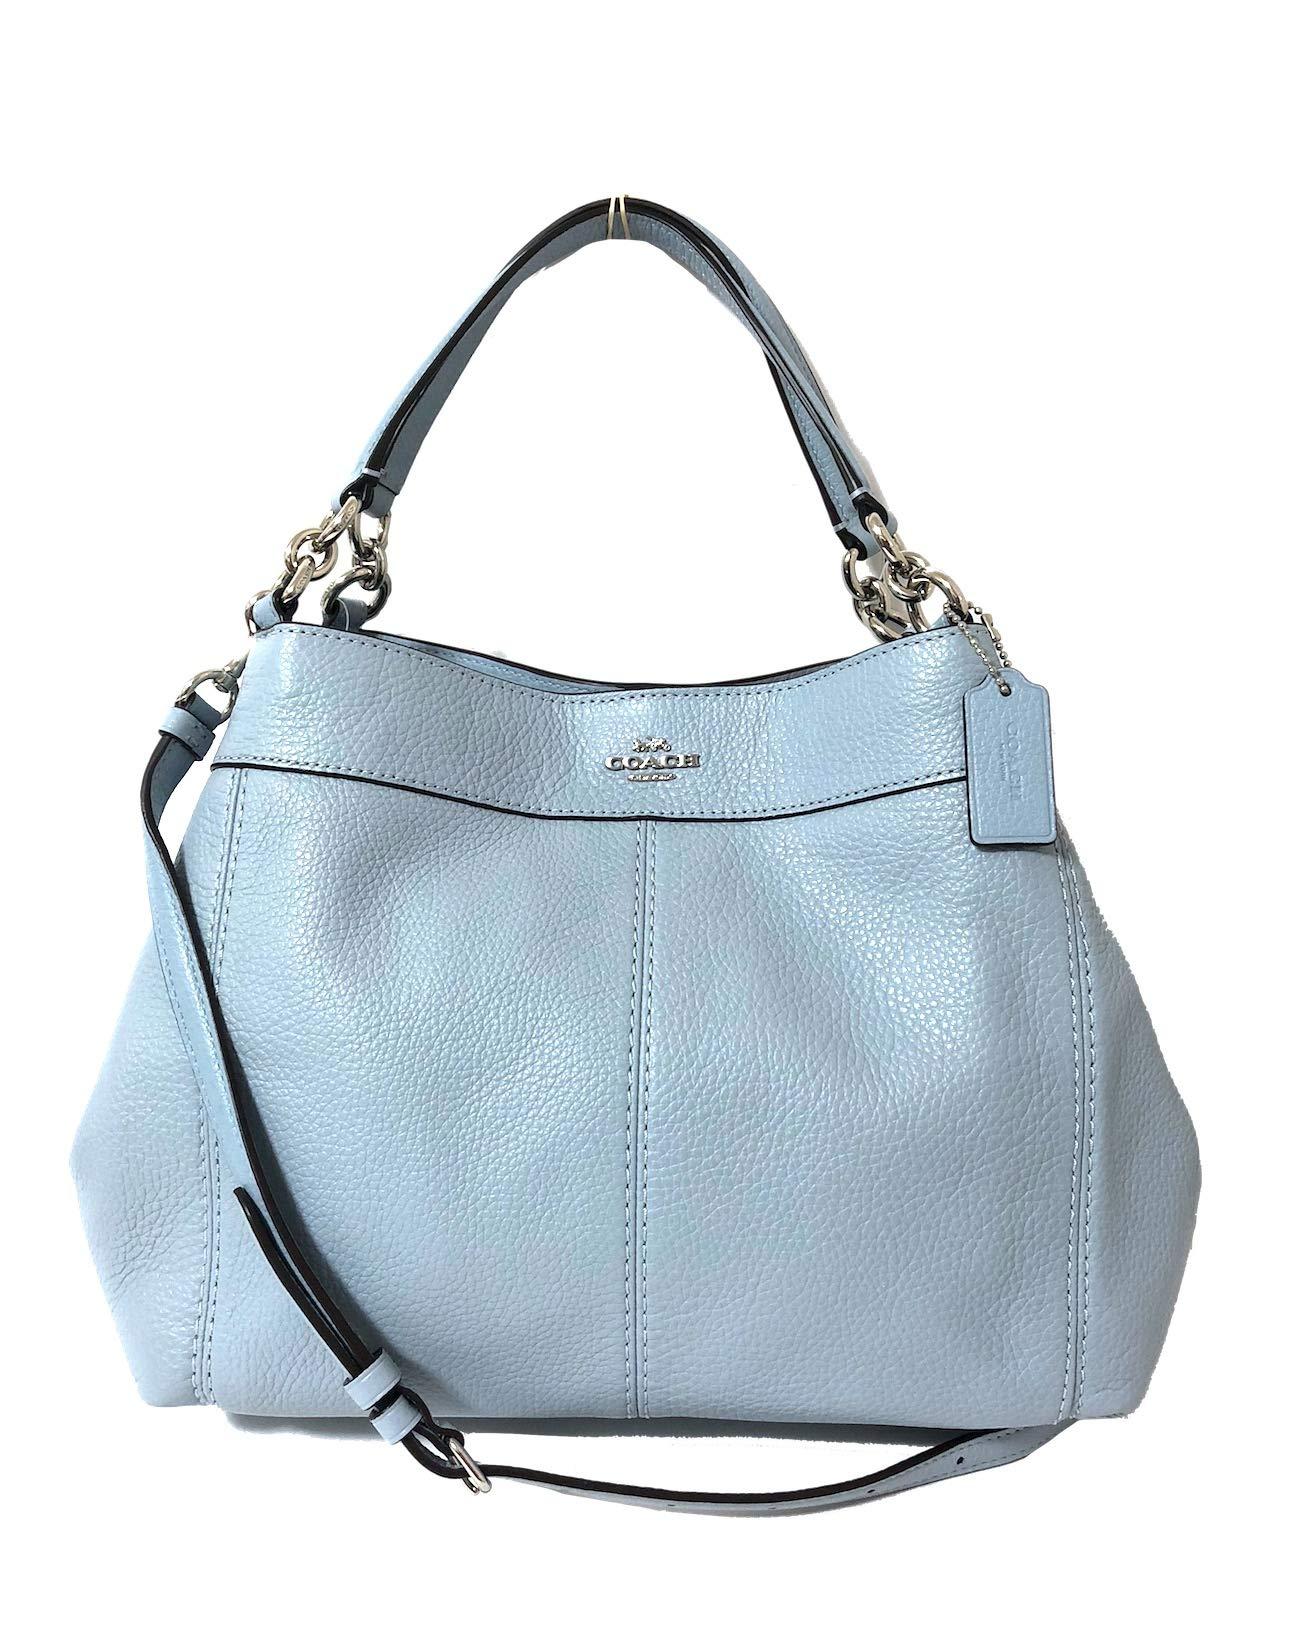 fa3bb08551f7 Galleon - Coach Pebbled Leather Small Lexy Shoulder Bag Handbag (SV Pale  Blue)